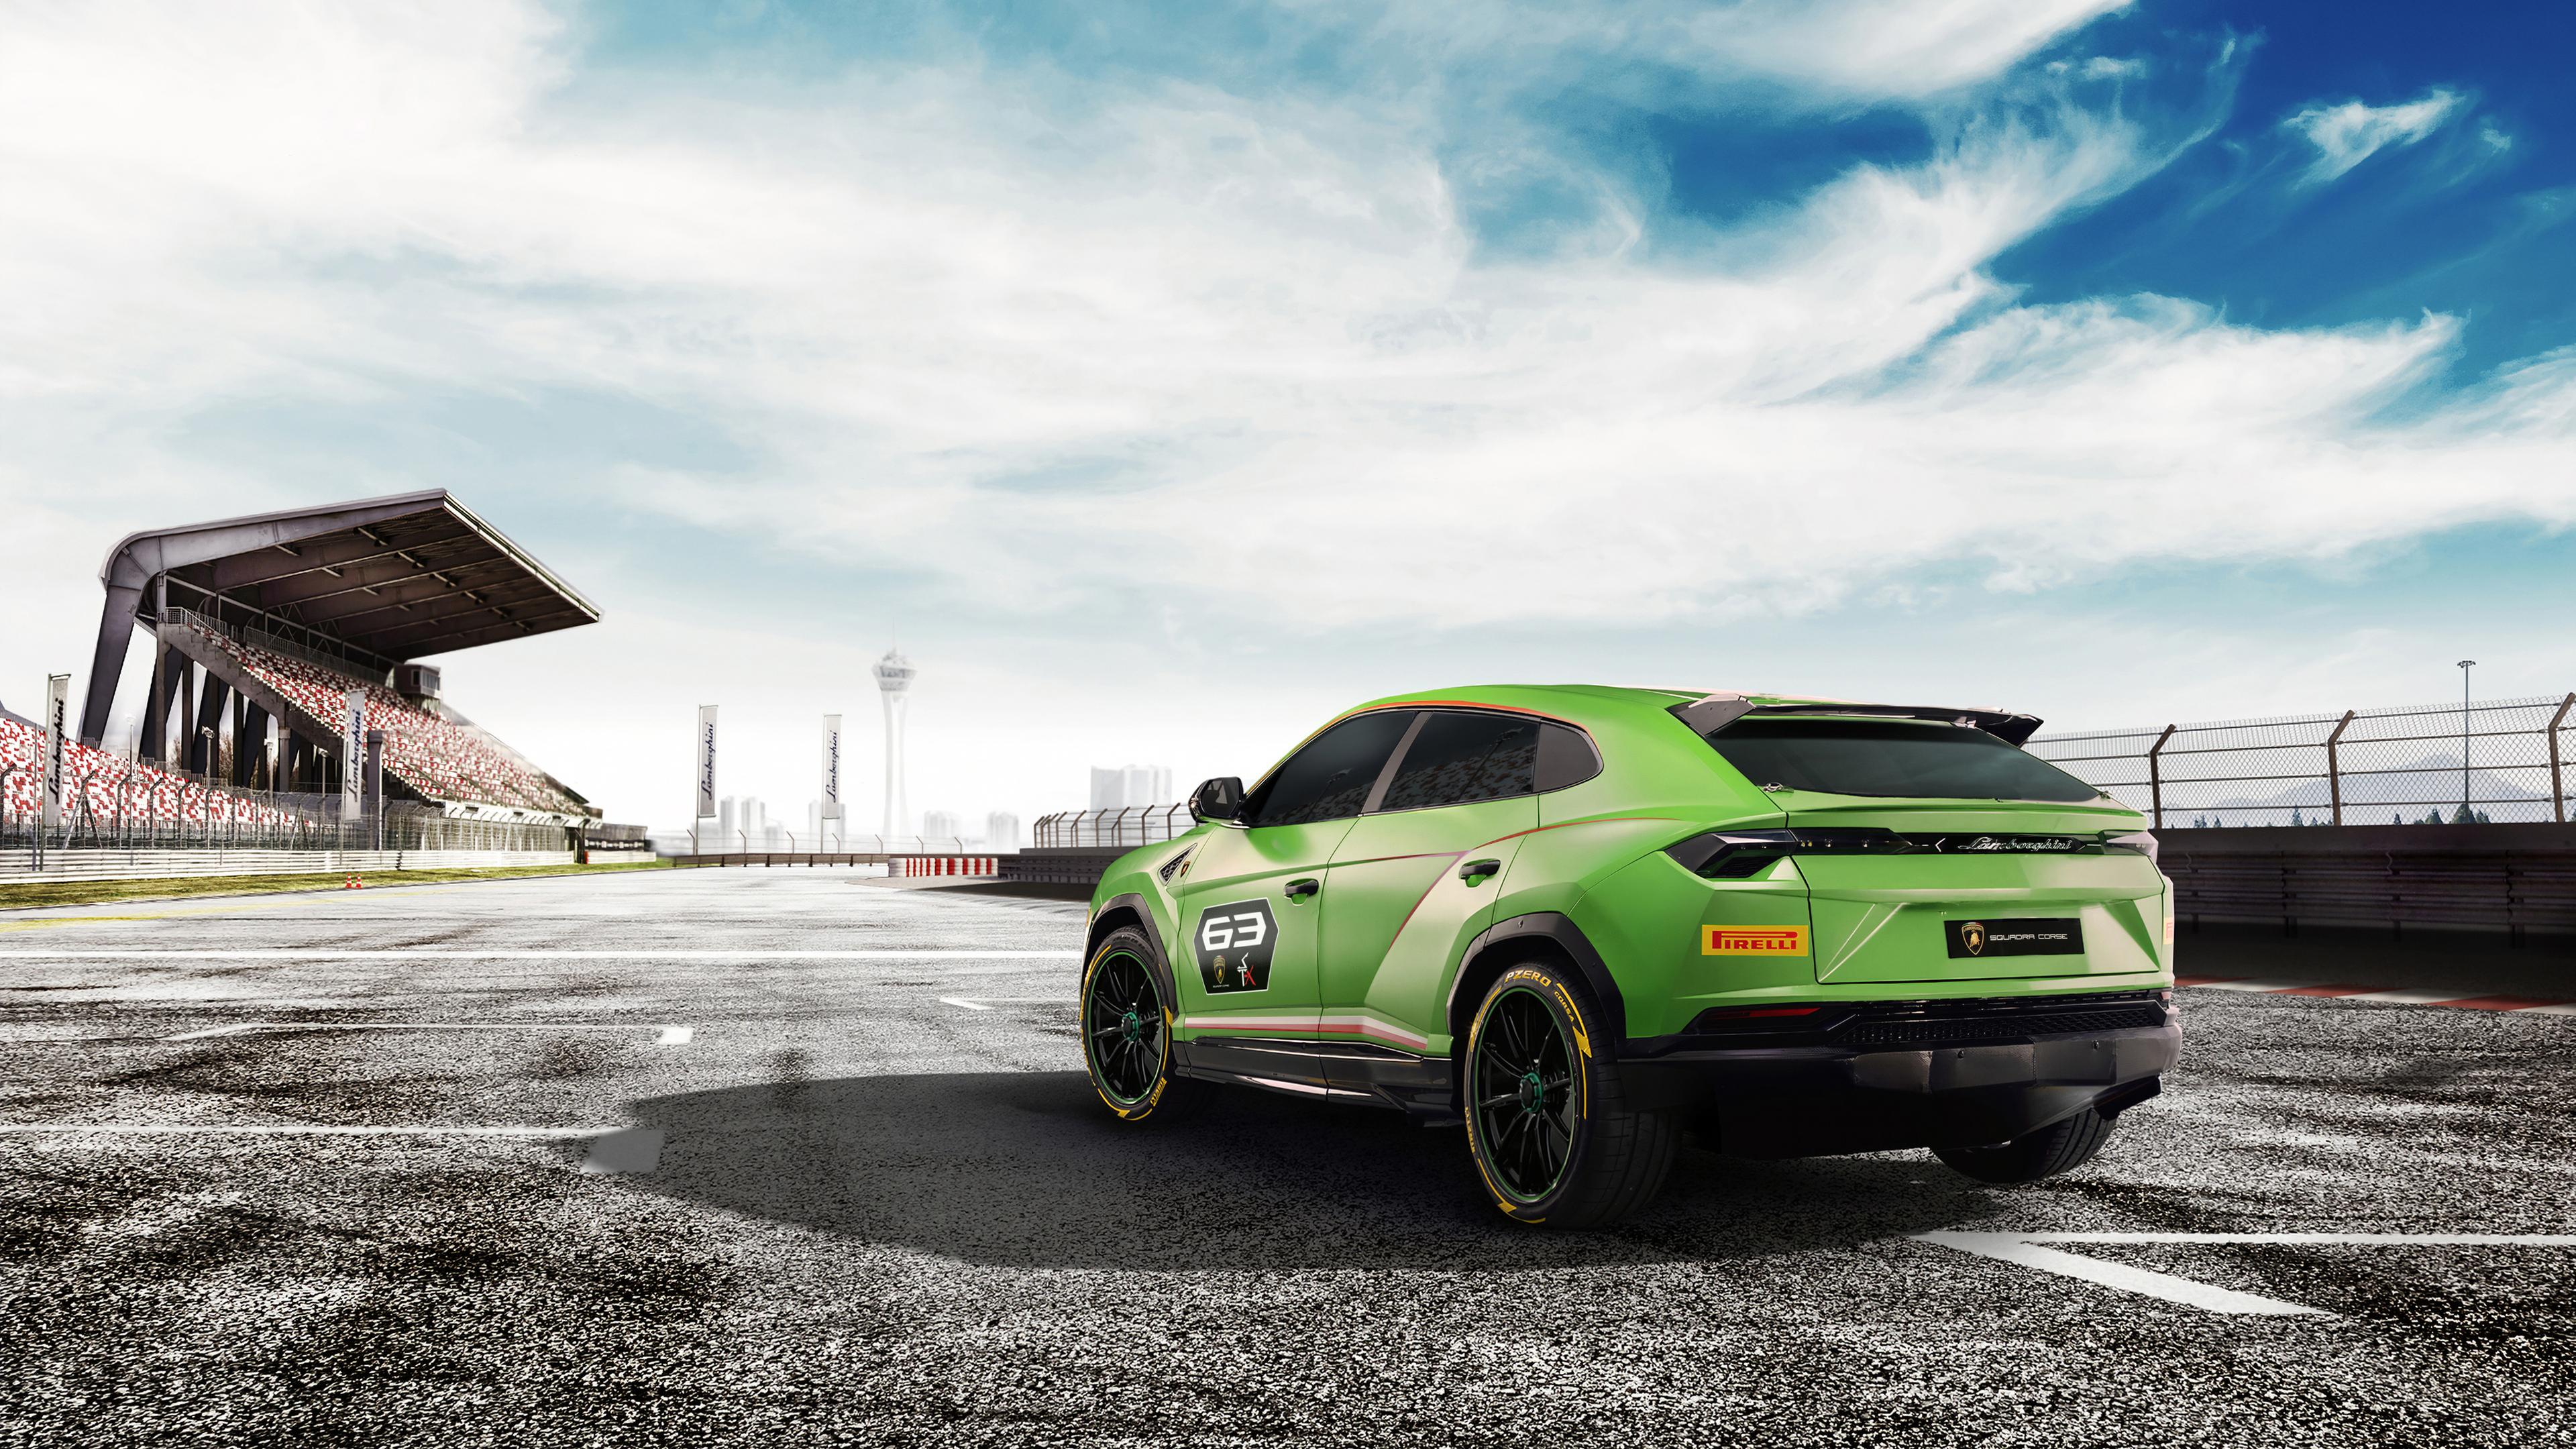 Wallpaper 4k 2018 Lamborghini Urus St X Concept Rear 4k 2018 Cars